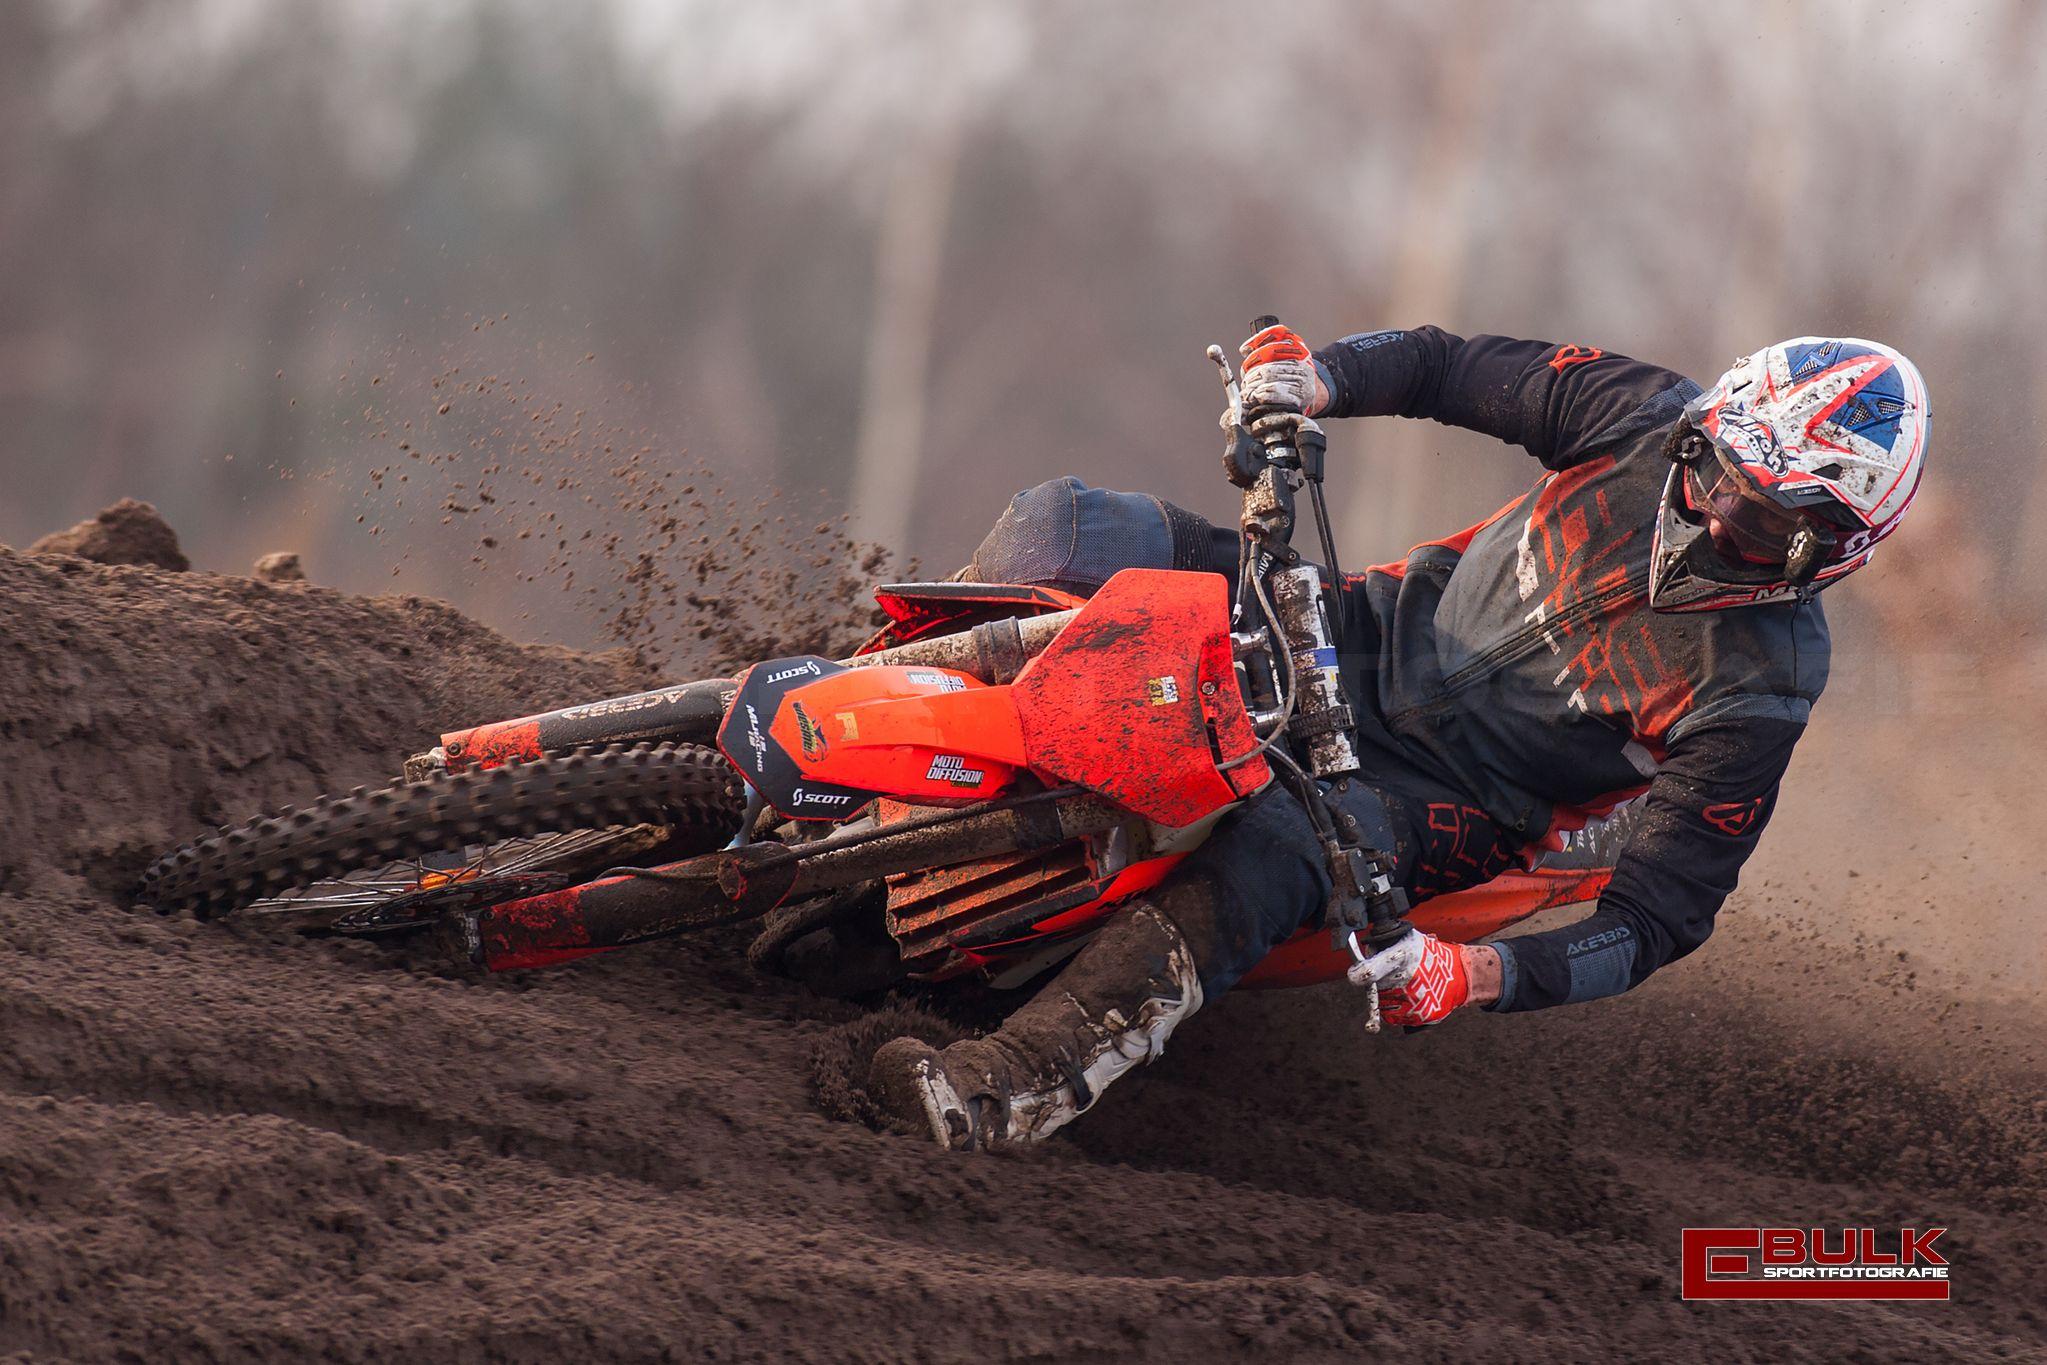 ebs_1371-ed_bulk_sportfotografie